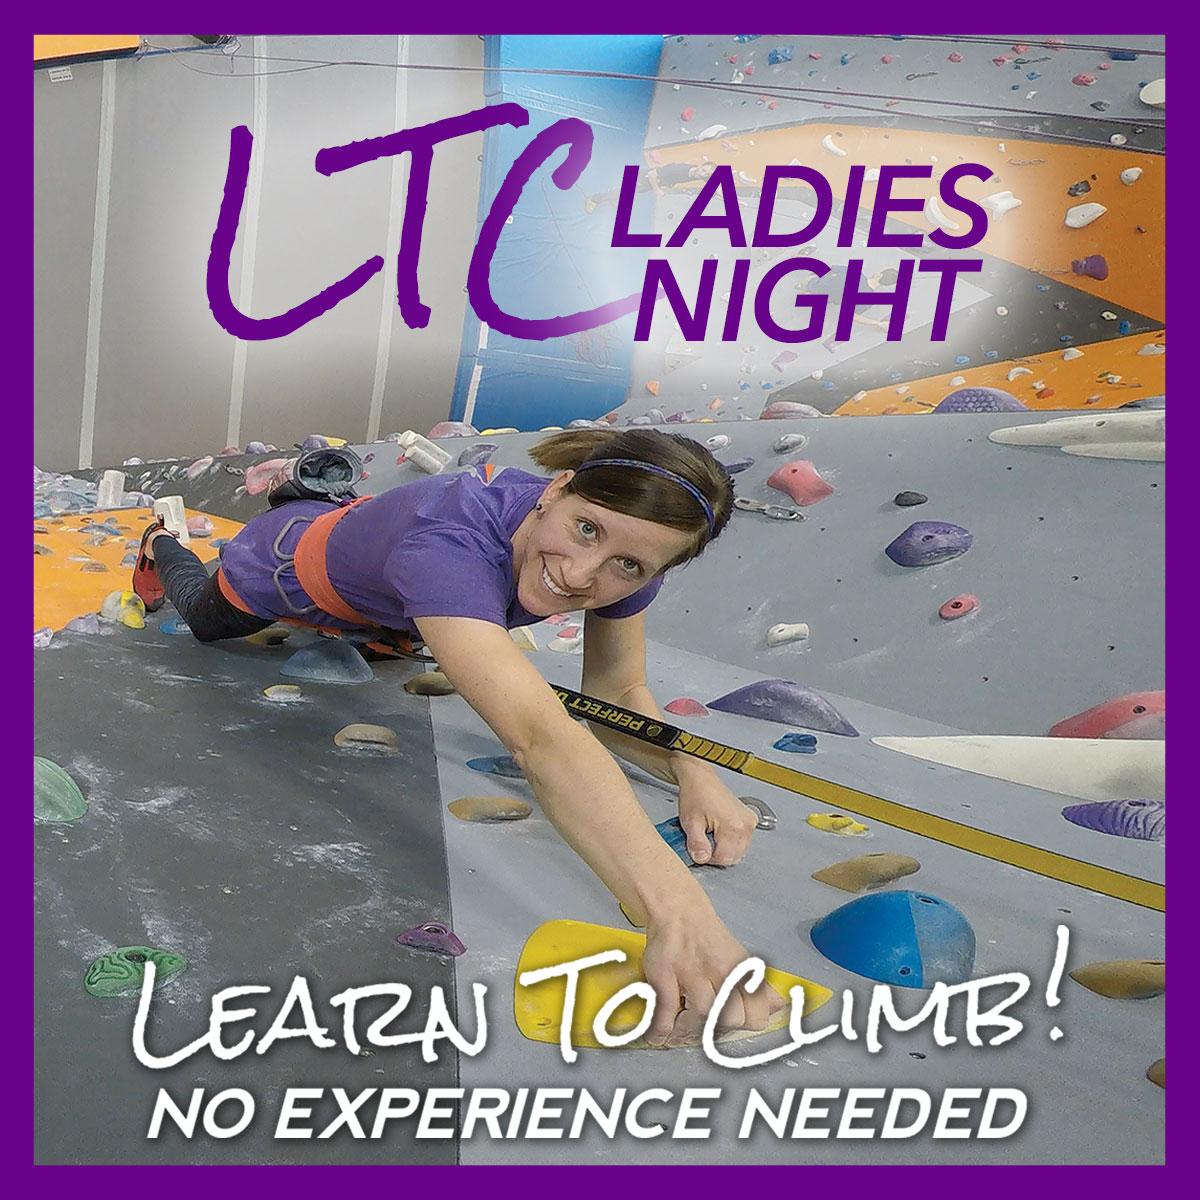 Learn to Climb 14+